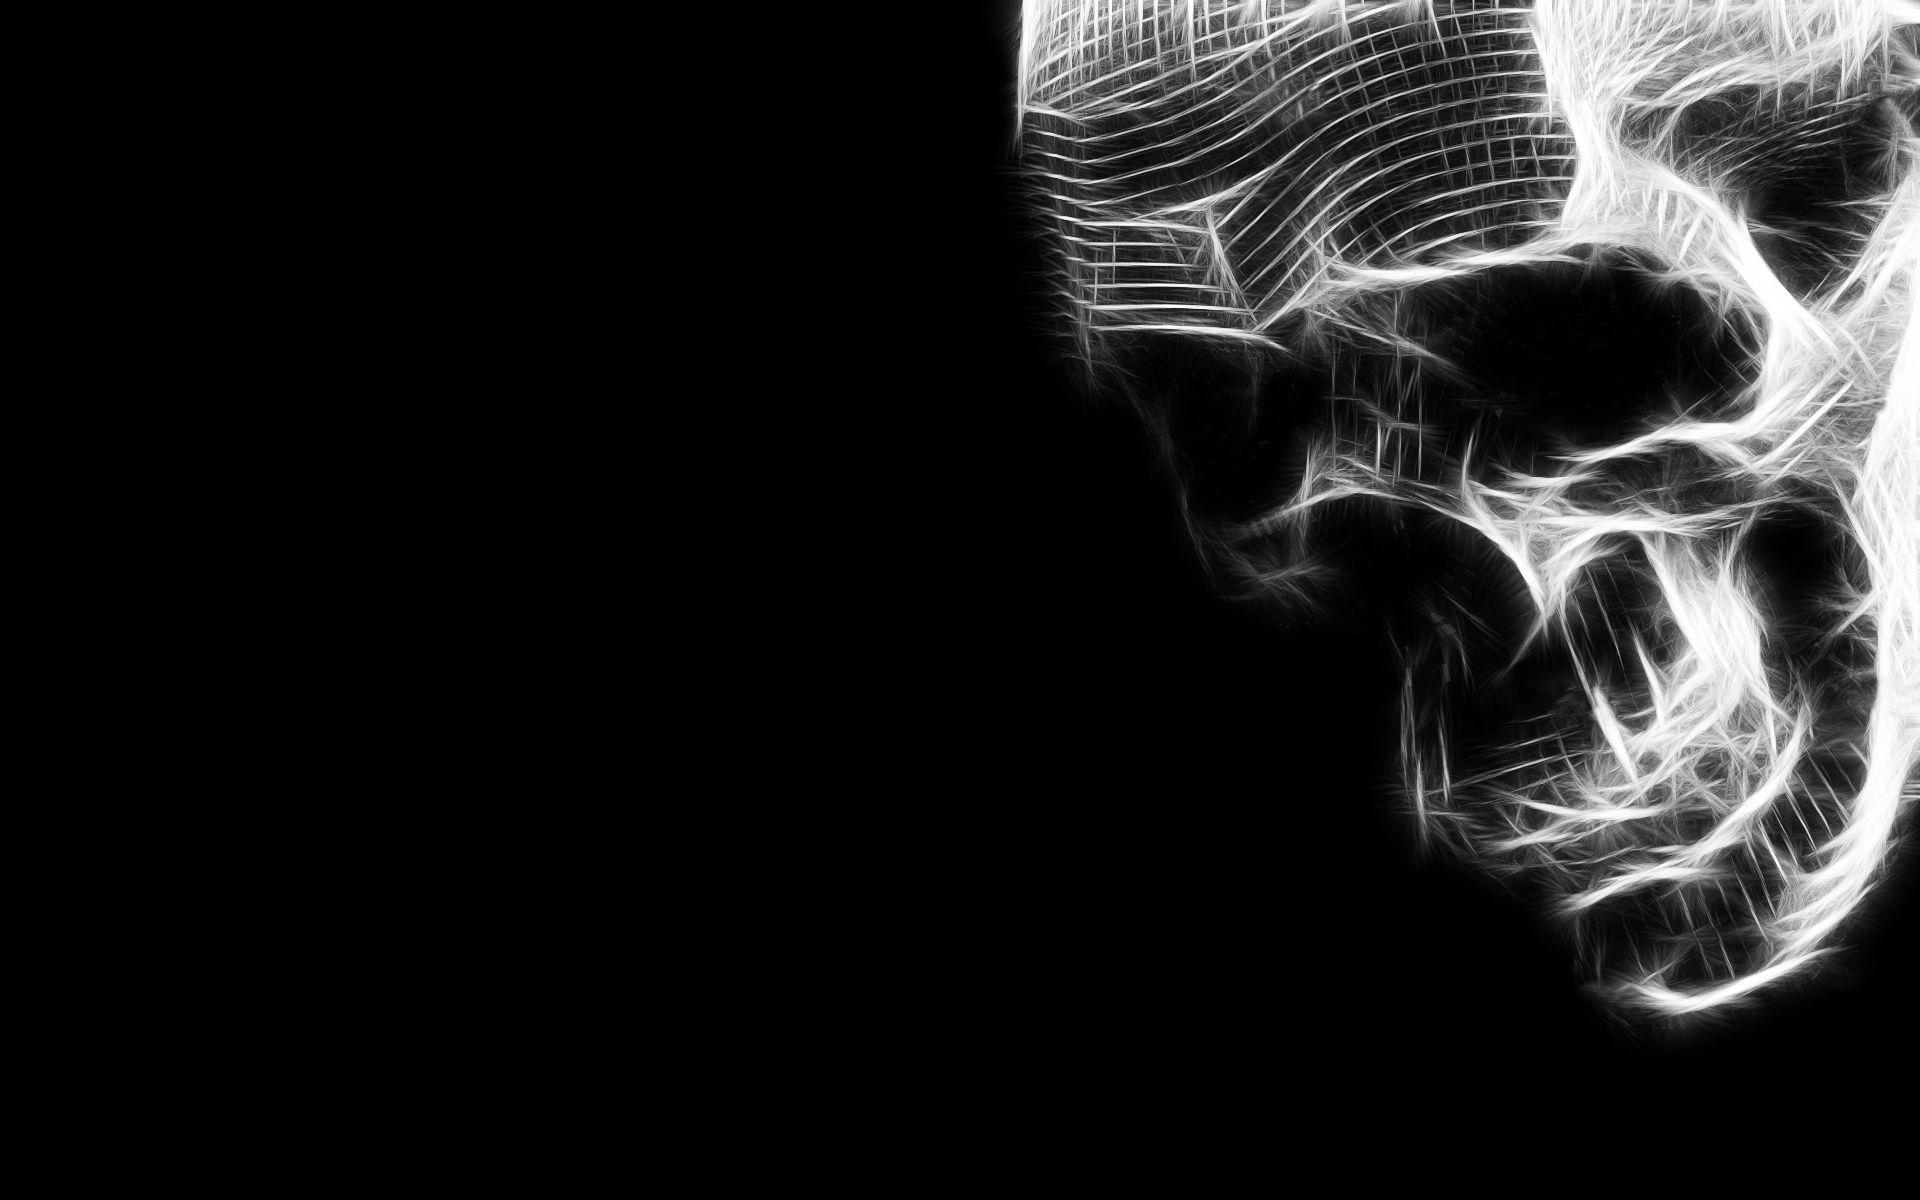 Black And White Abstract Skulls Black And Green Skull Fantasi Tengkorak